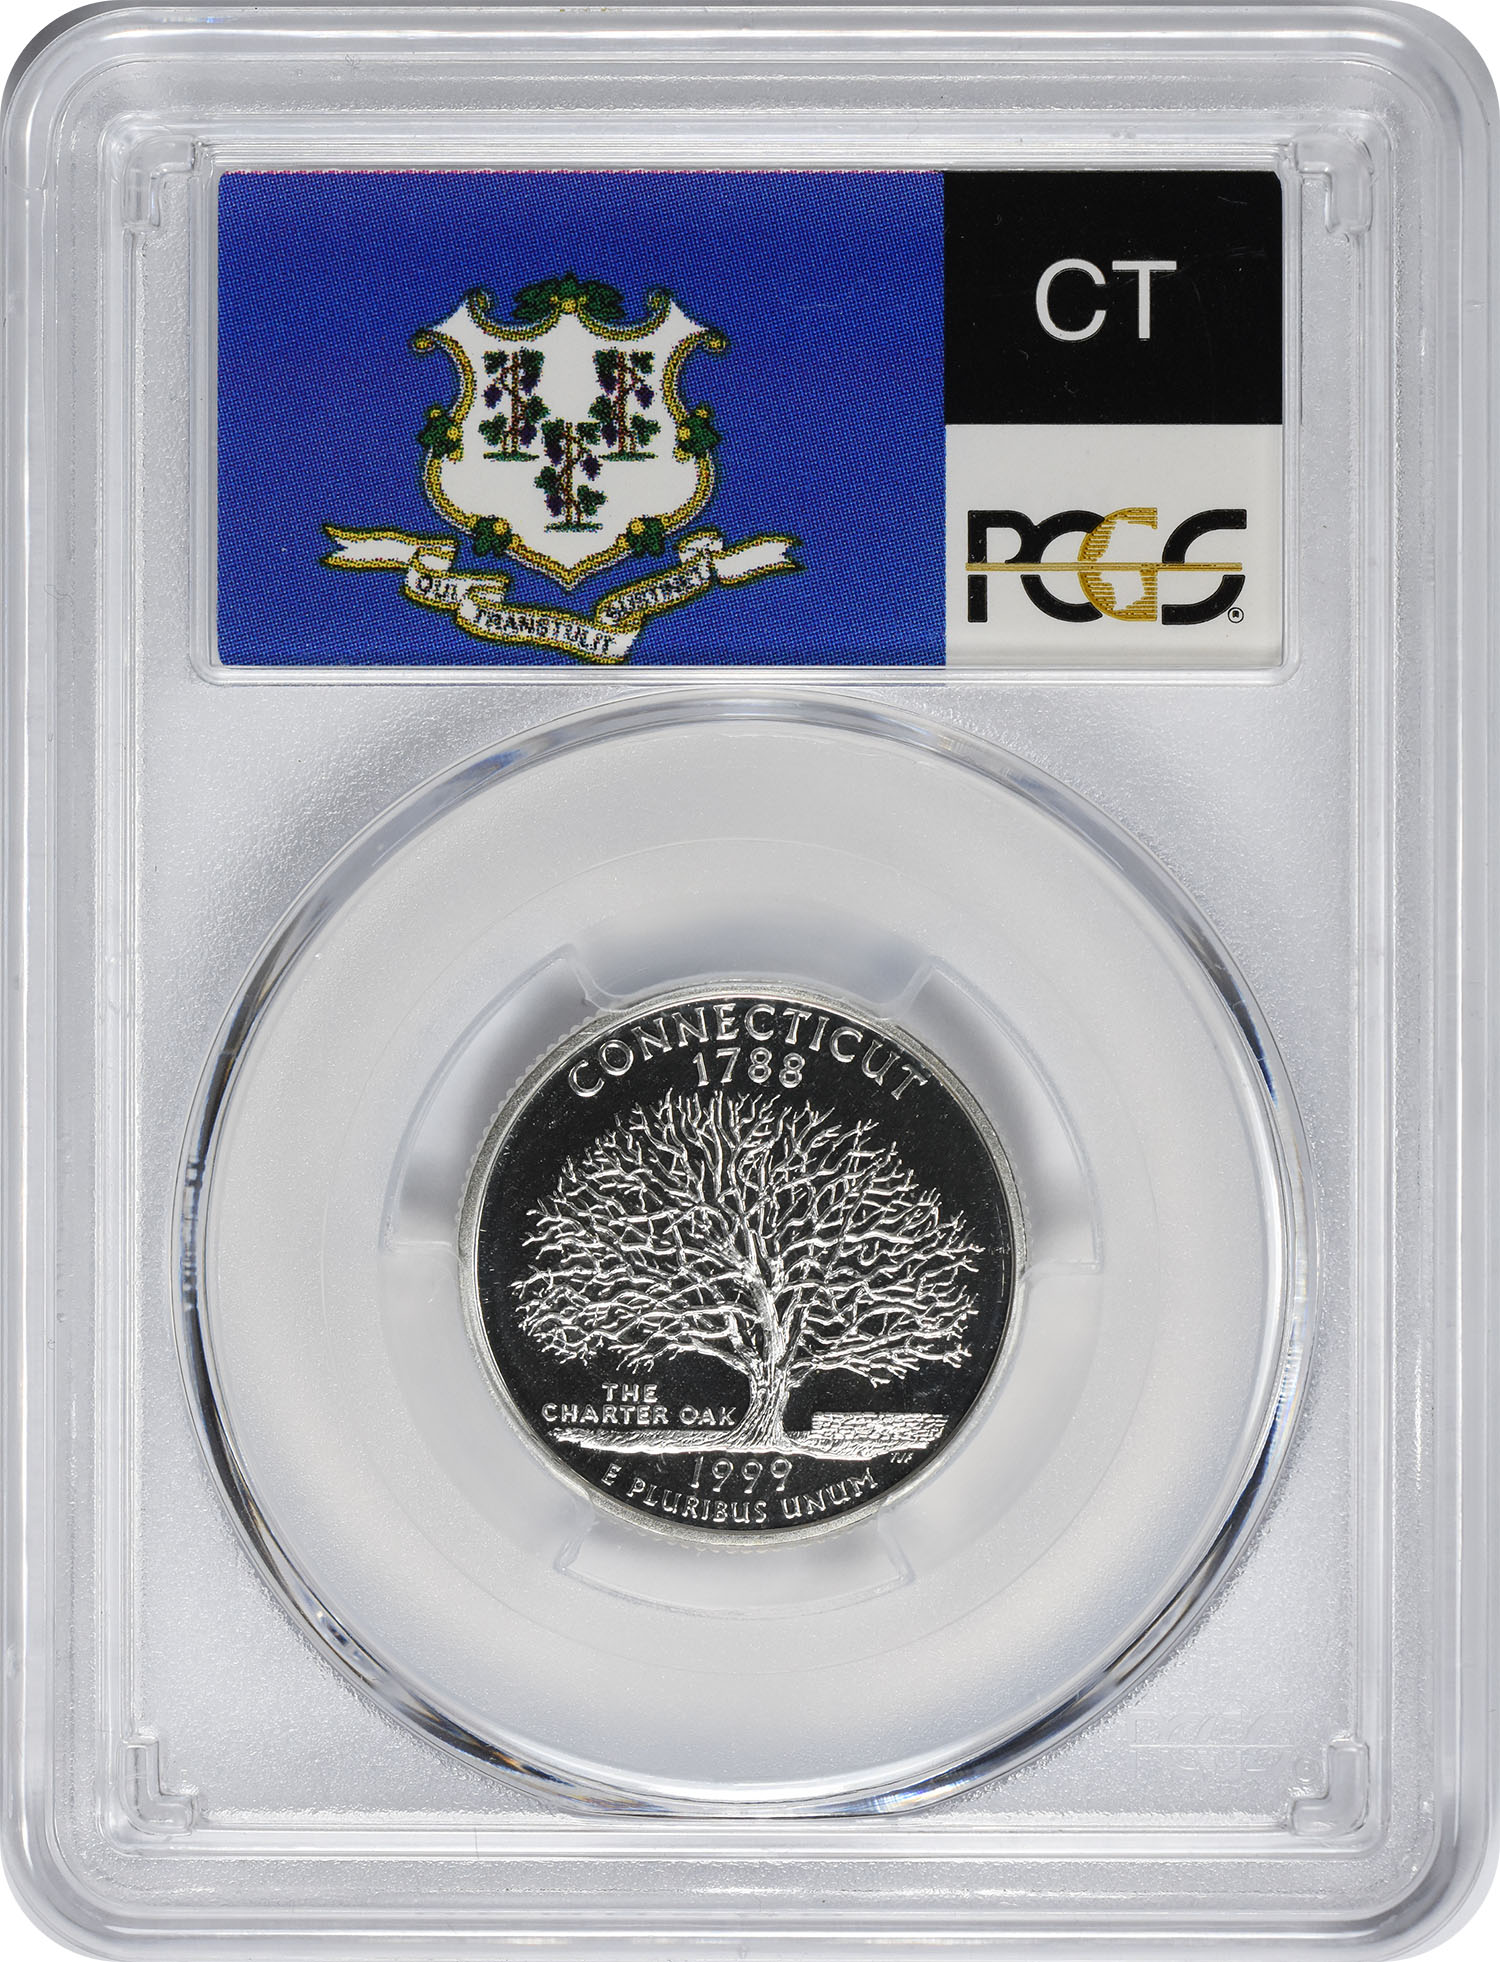 1999-S Connecticut State Quarter, PR69DCAM, Silver, PCGS